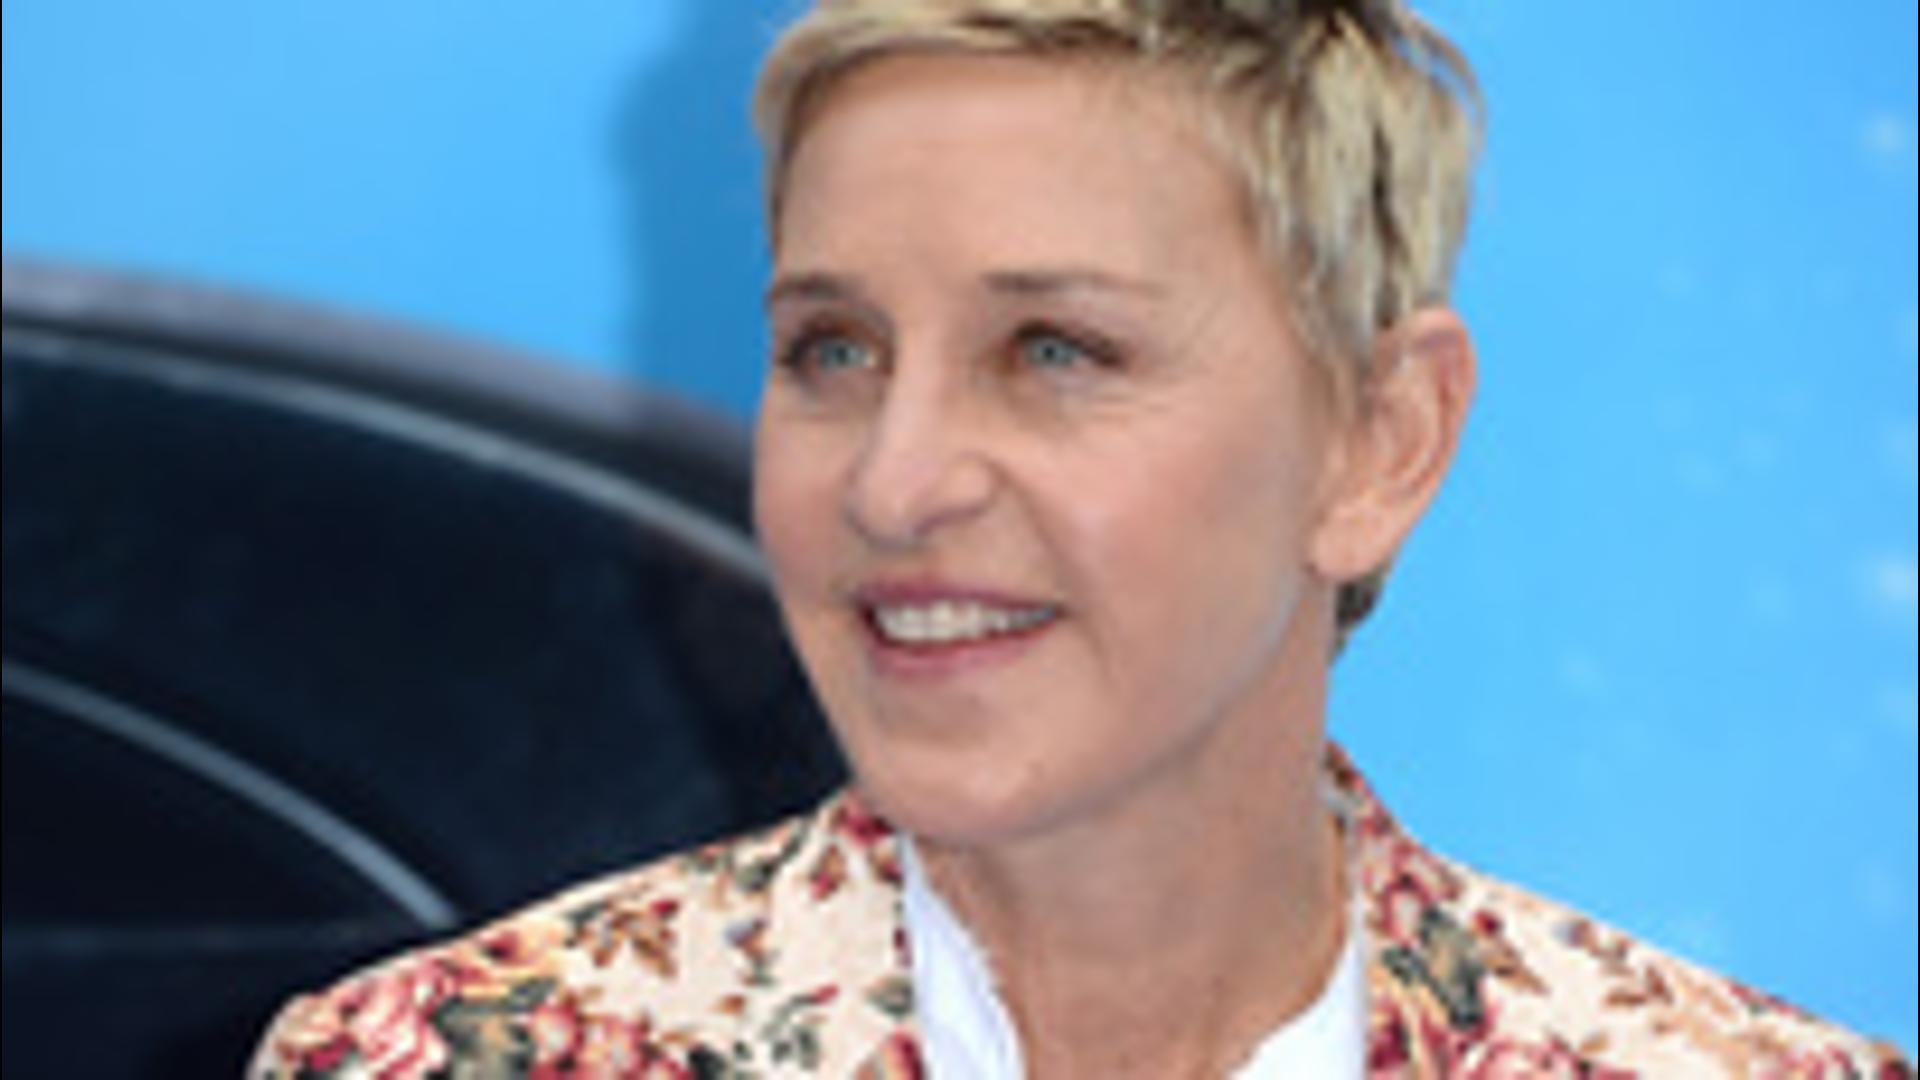 Ellen DeGeneres launches faux fur brand UnHide to fight animal cruelty